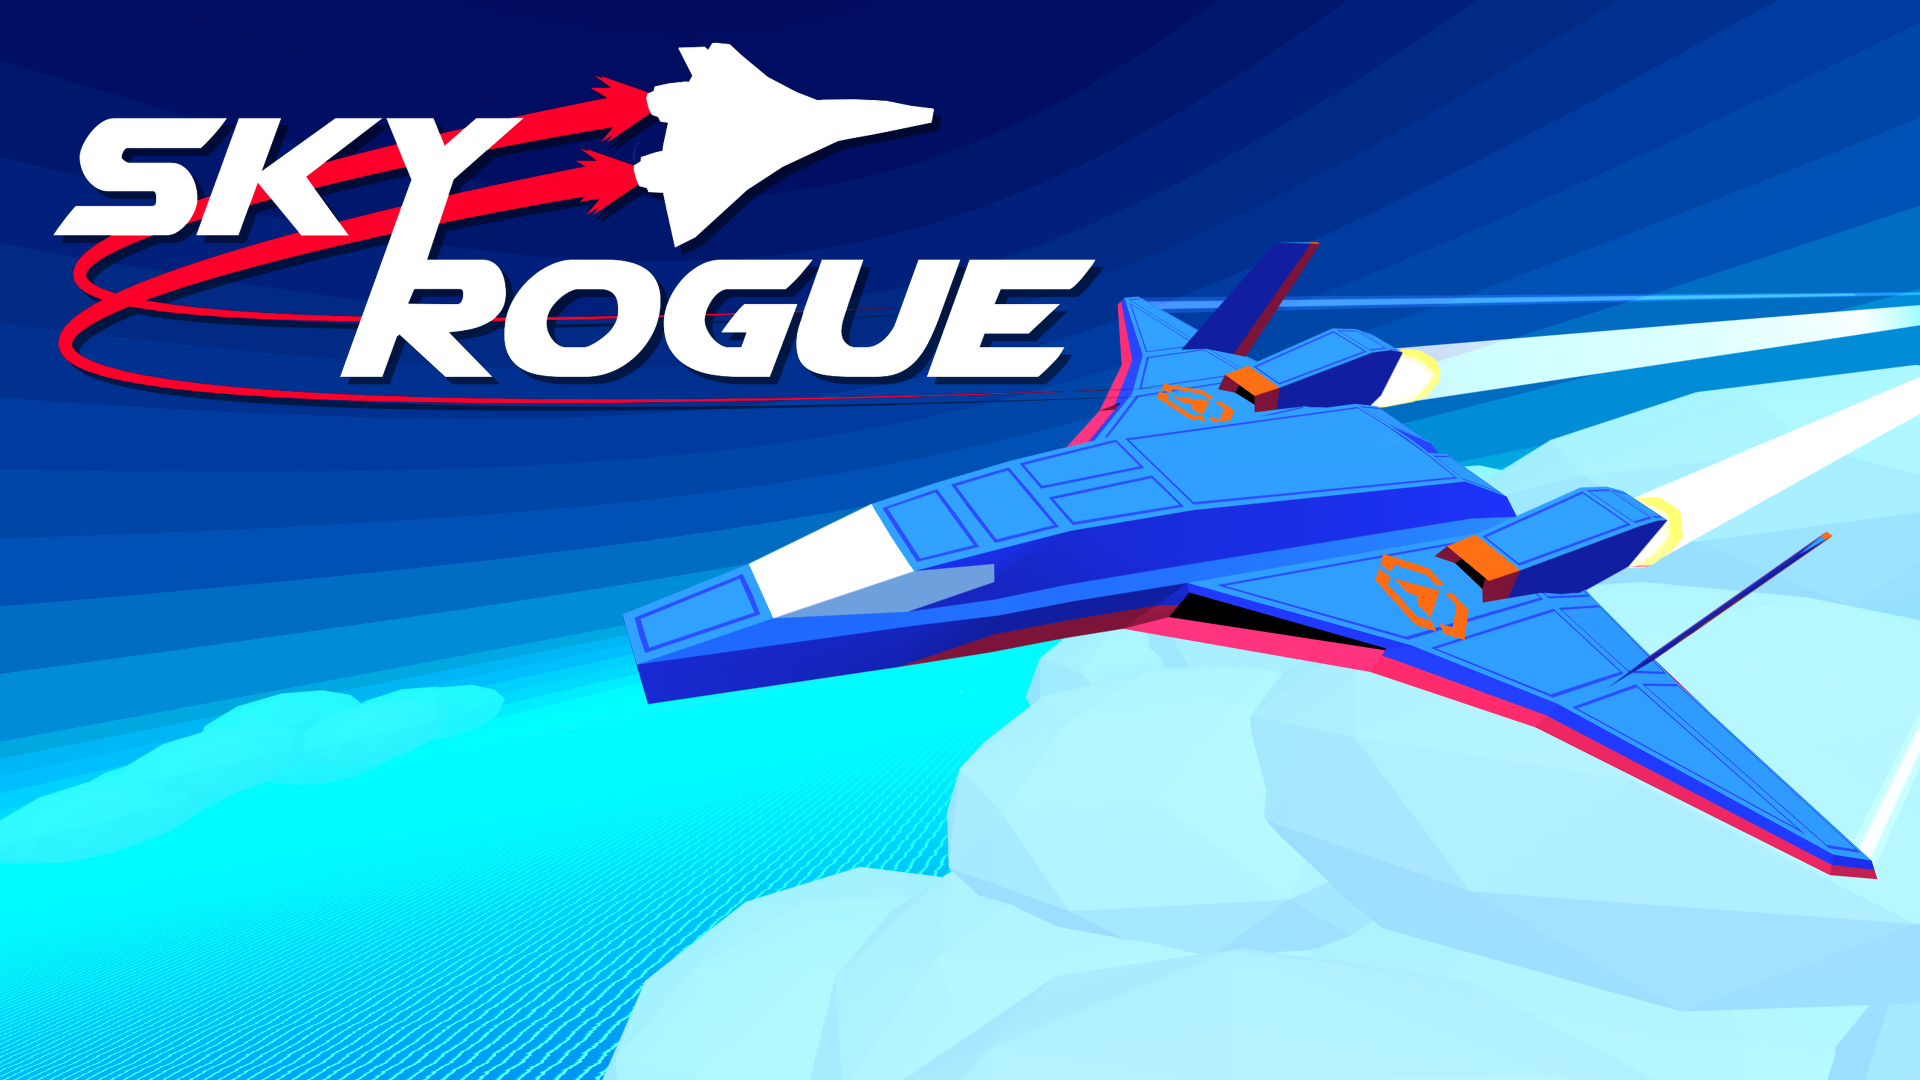 Sky Rogue One